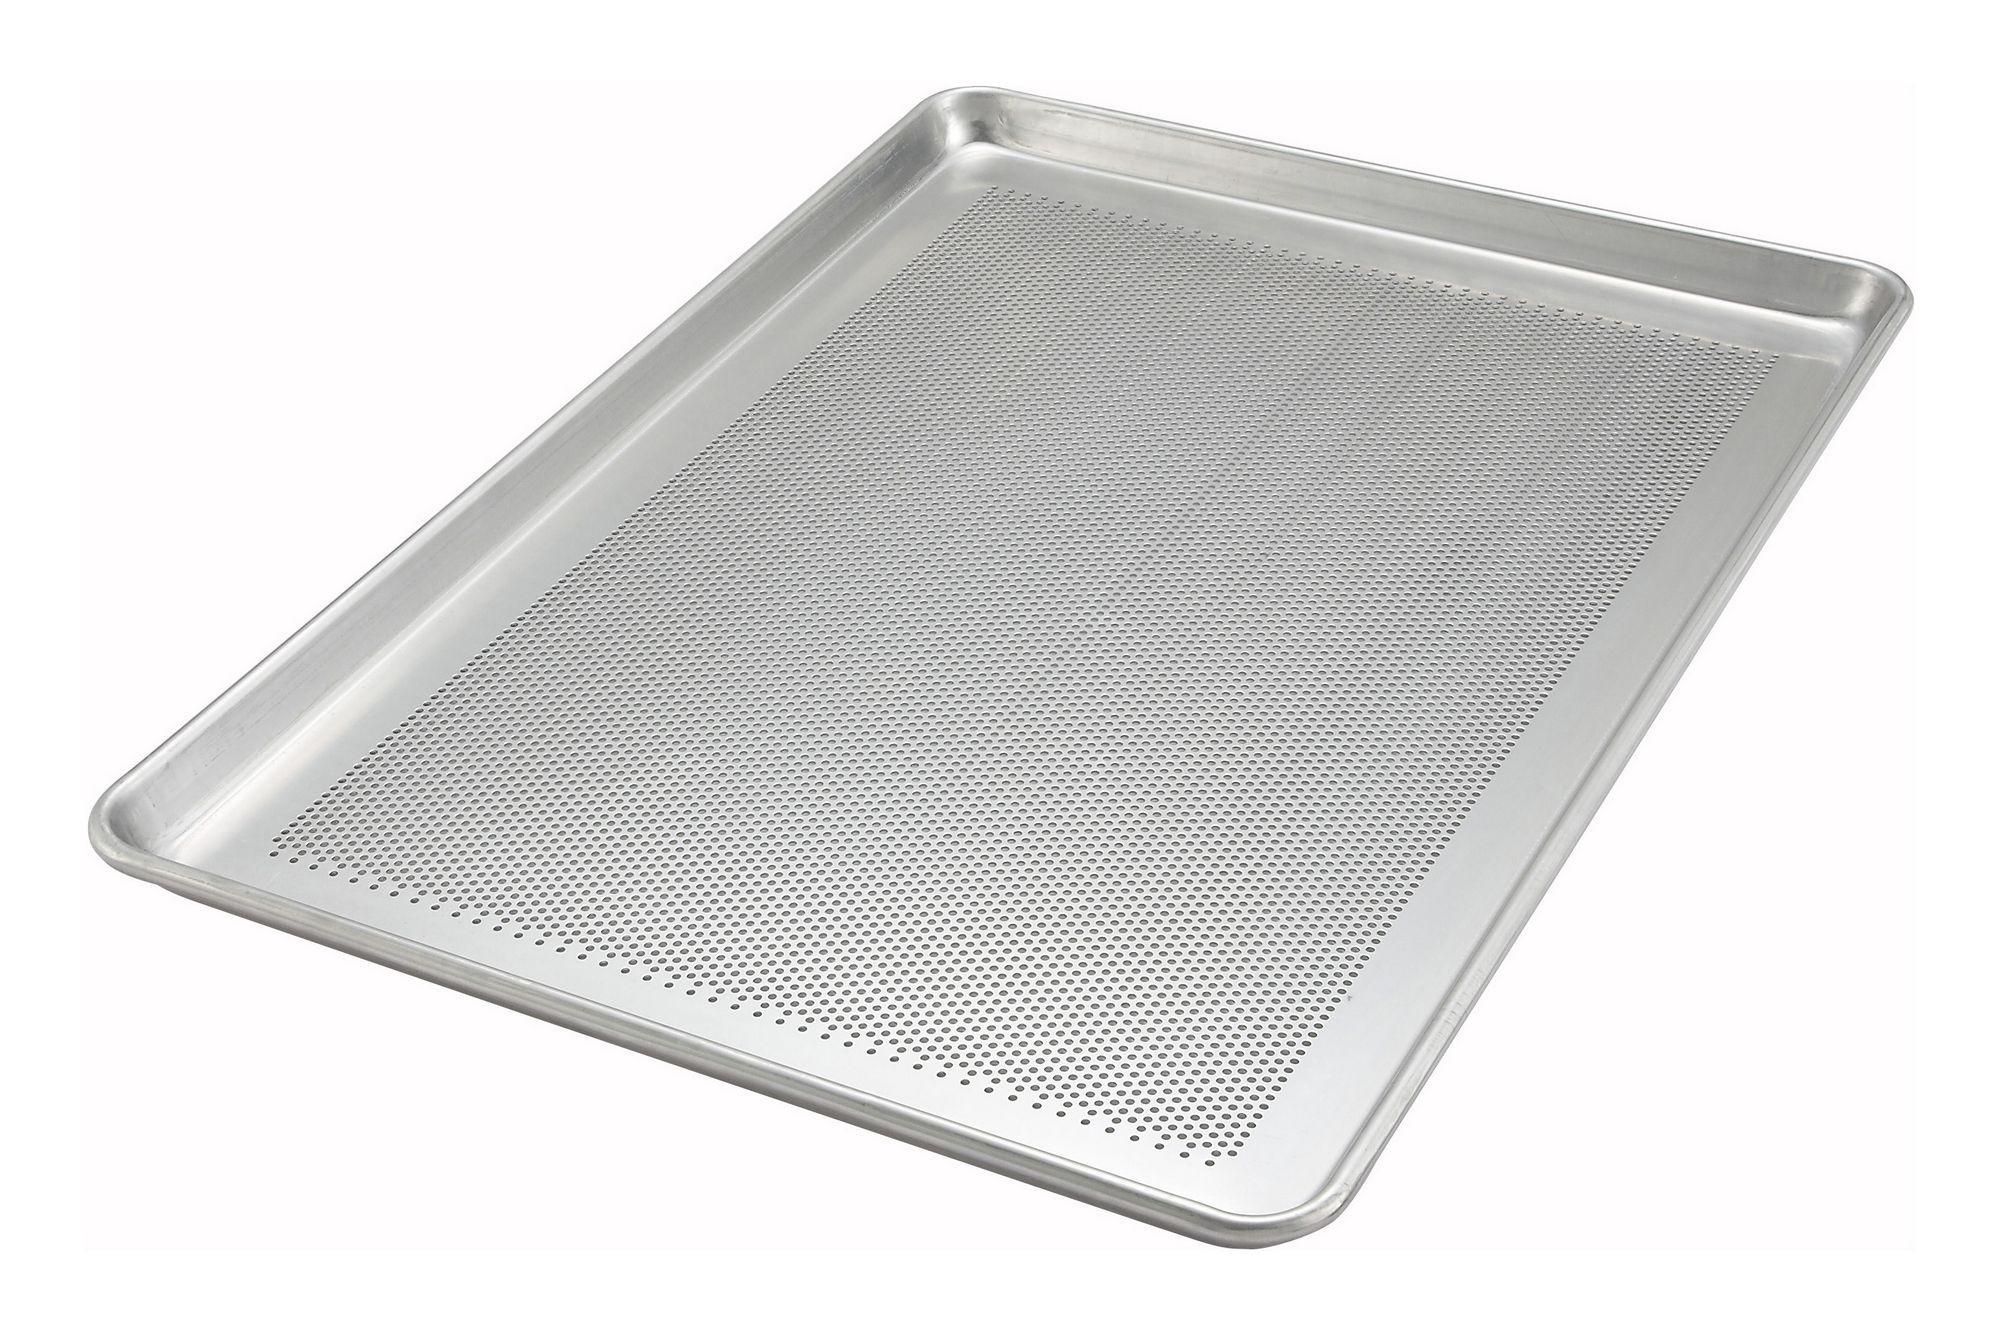 "Winco ALXP-1826P Full Size Perforated Aluminum Sheet Pan 18"" x 26"""